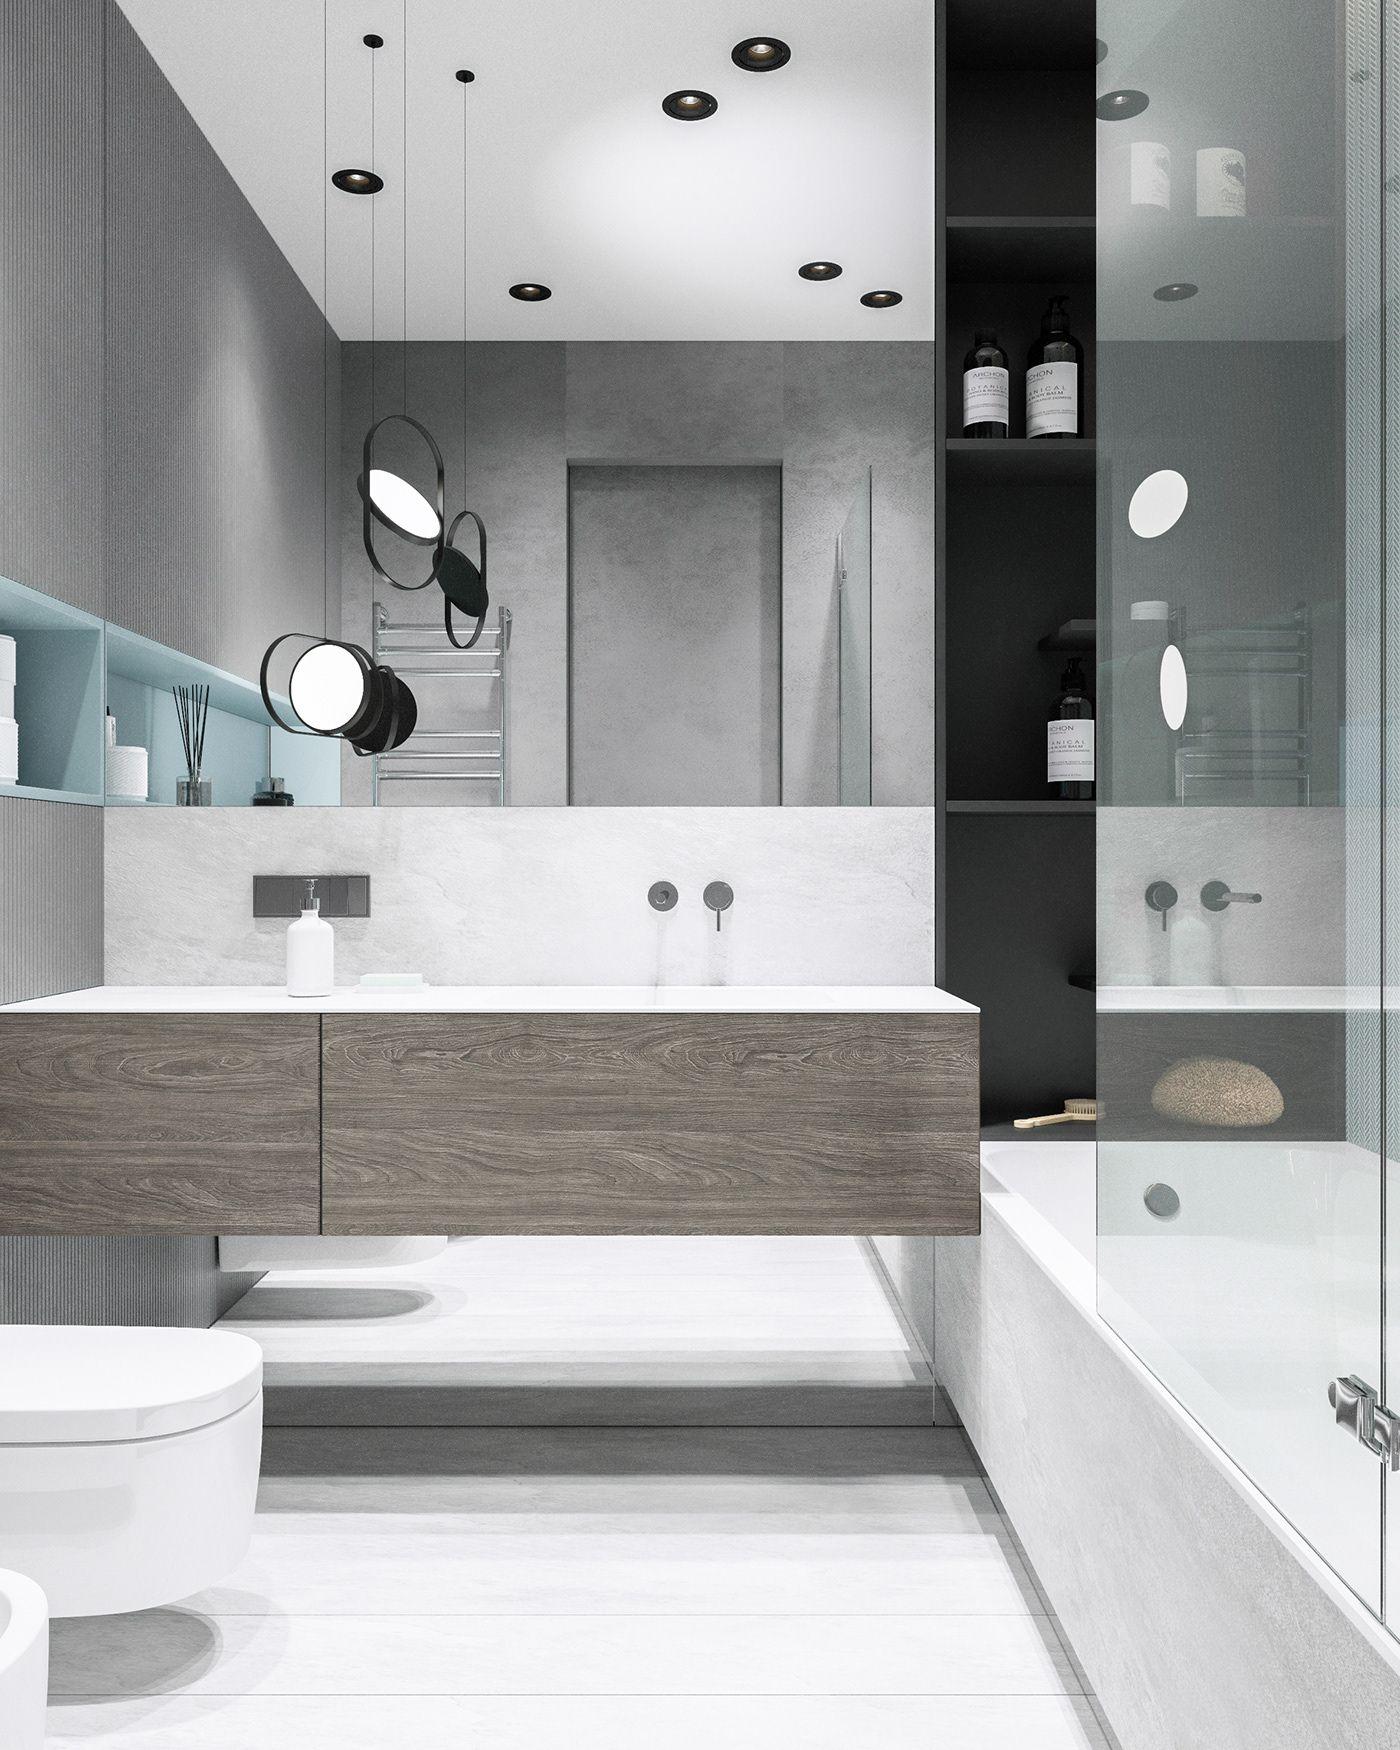 Mops Litca On Behance Bathroom Interior Design Top 10 Bathrooms Bathroom Interior Bathroom interior design modern